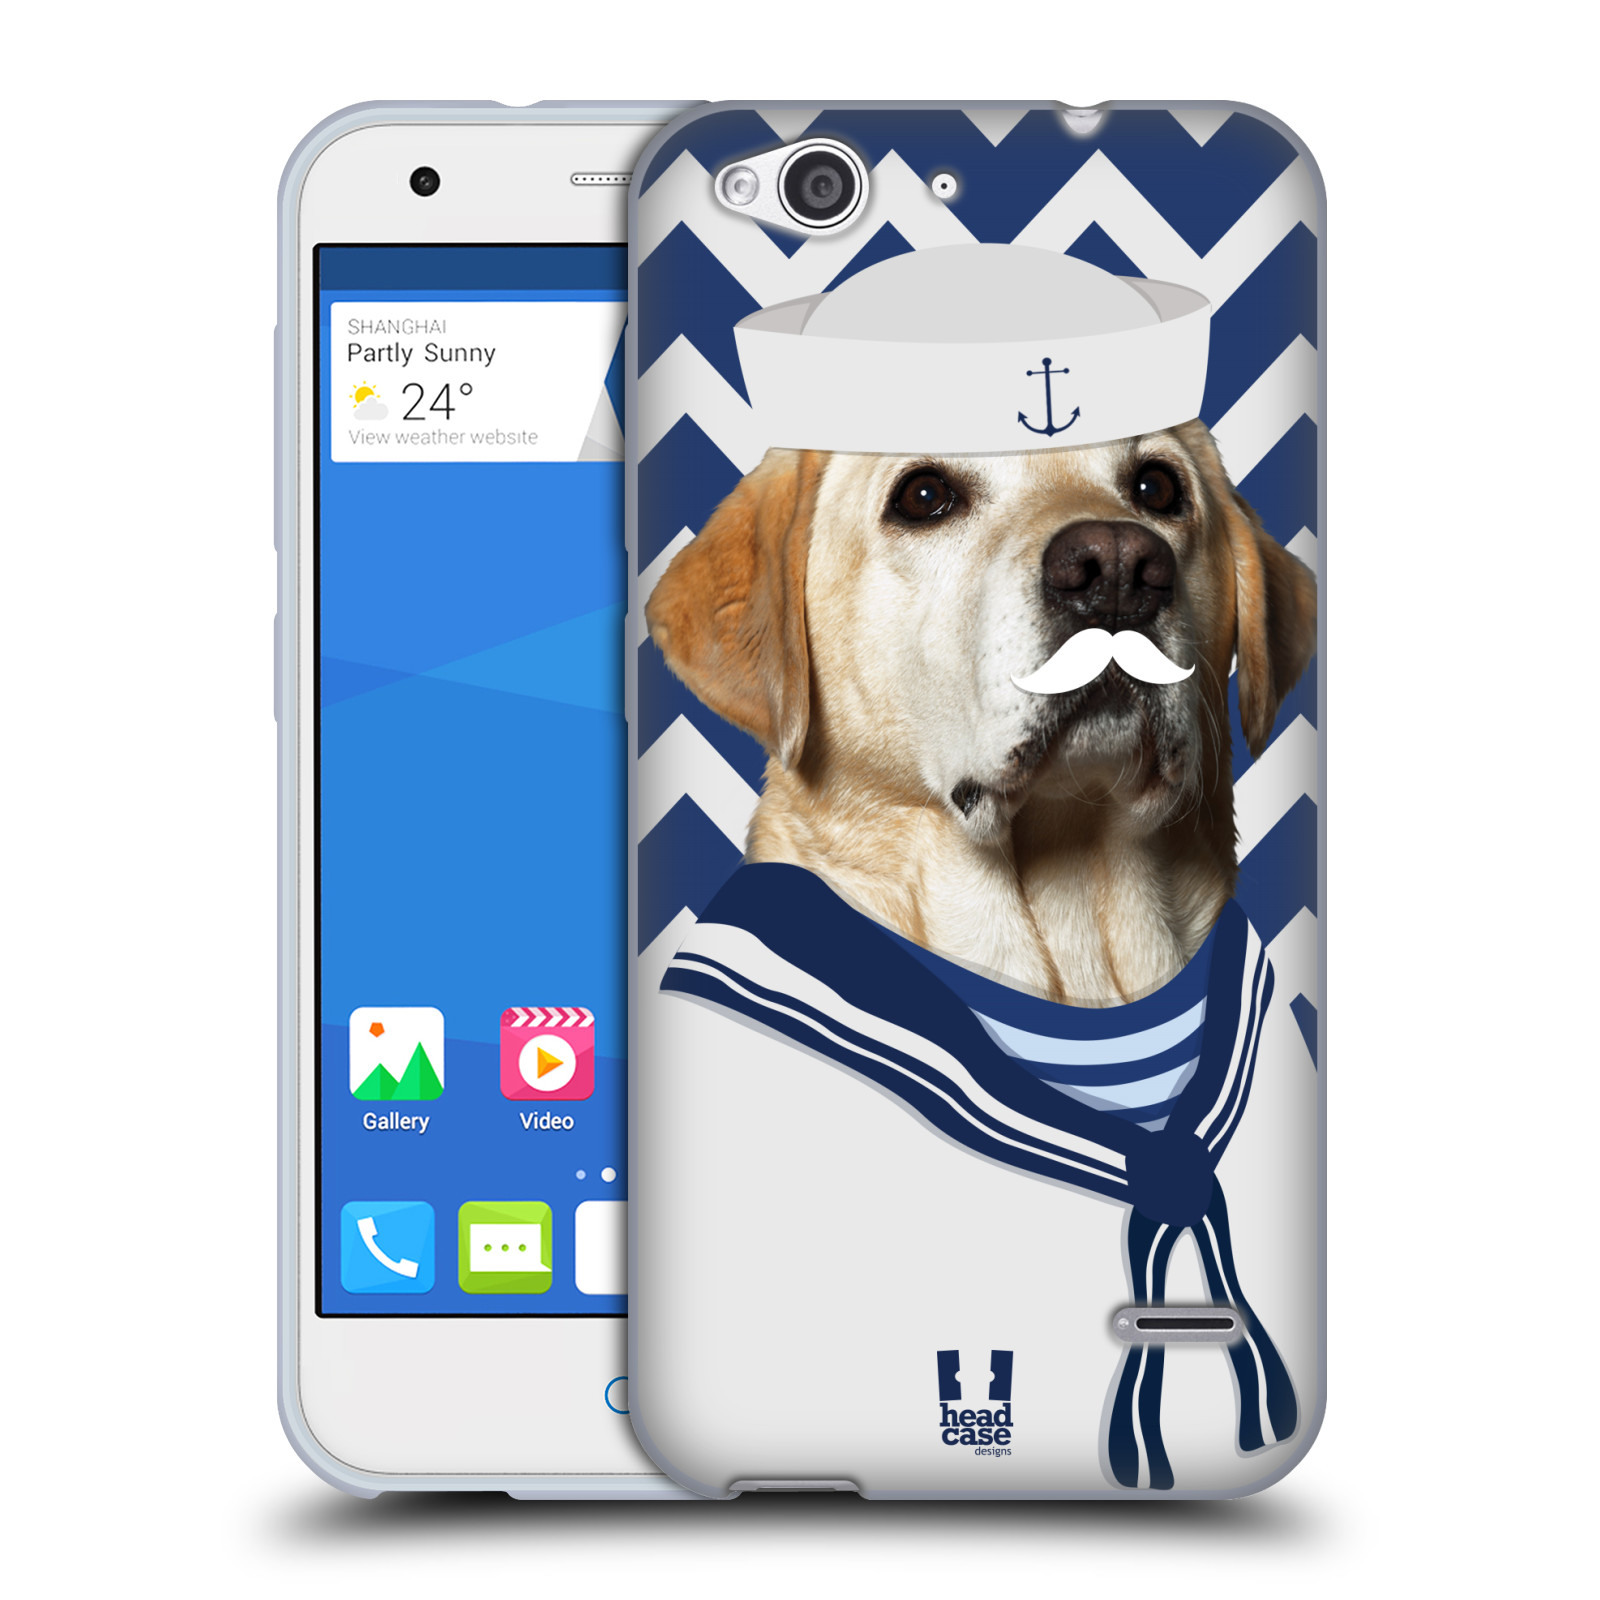 HEAD-CASE-DESIGNS-ANIMALS-AND-PROFESSION-SOFT-GEL-CASE-FOR-ZTE-PHONES